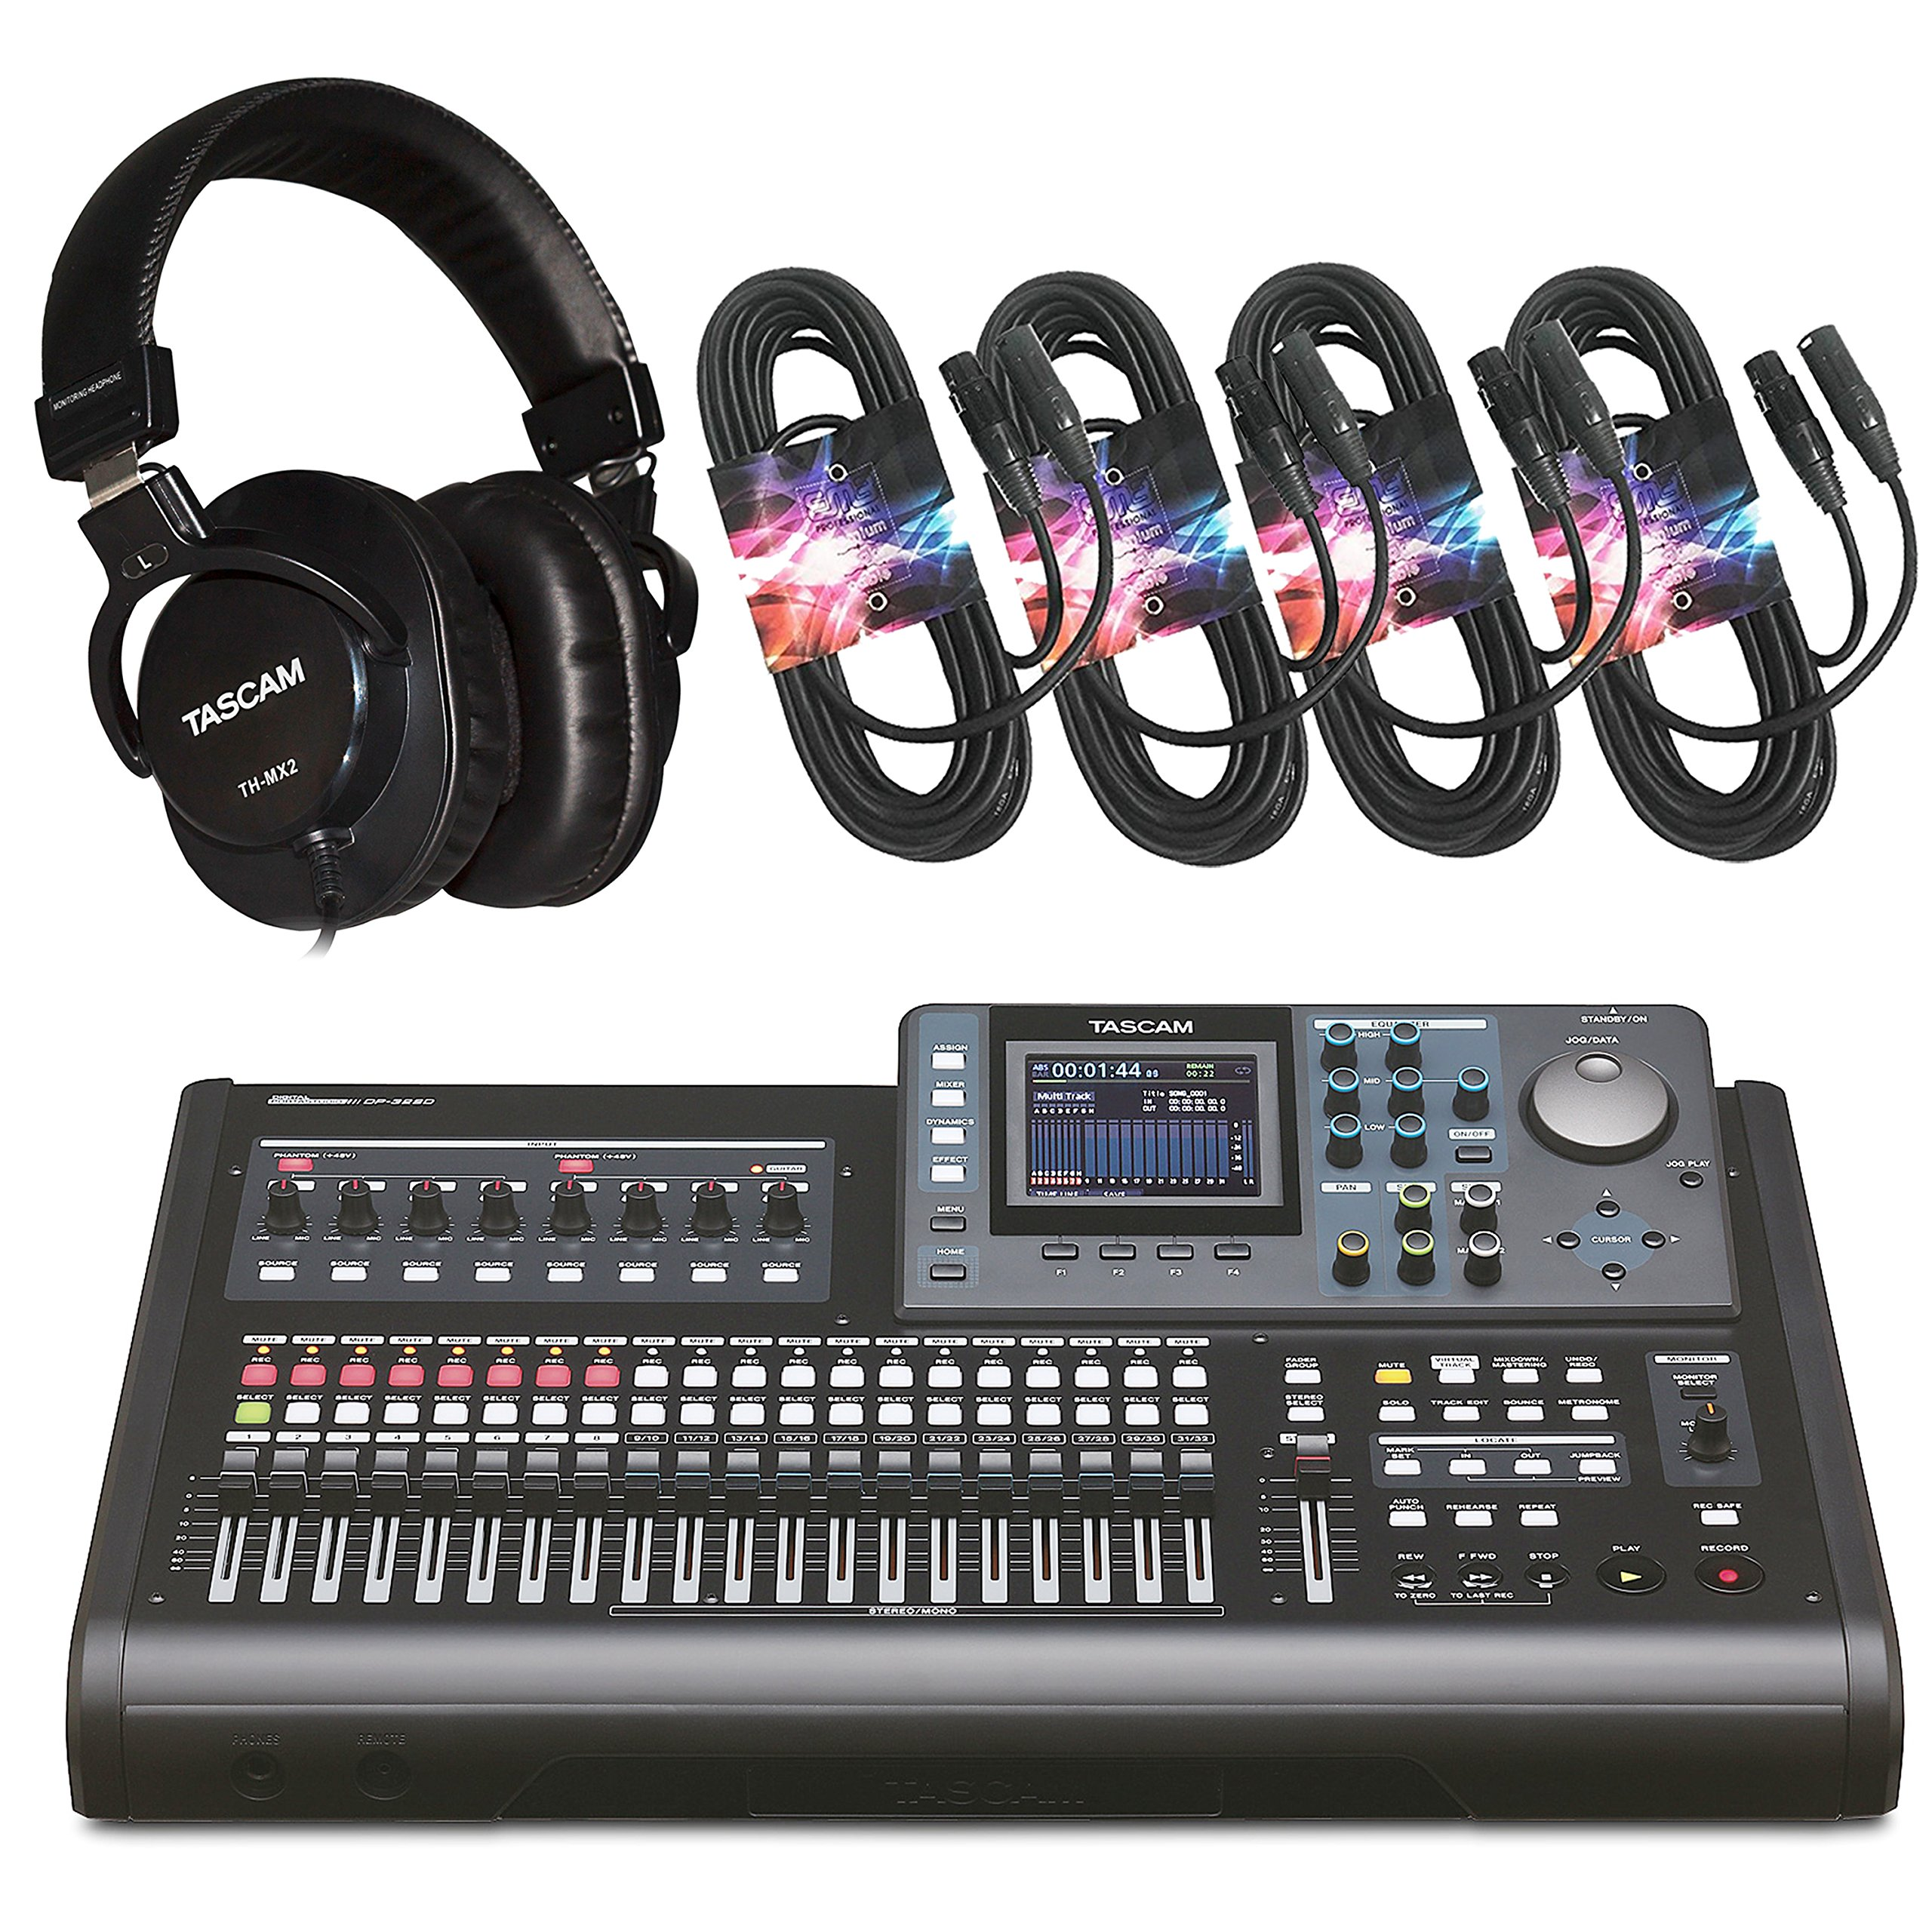 Tascam DP-32SD 32 Tracks Digital Portastudio + TH-MX2 Heaphones + XLR Cables